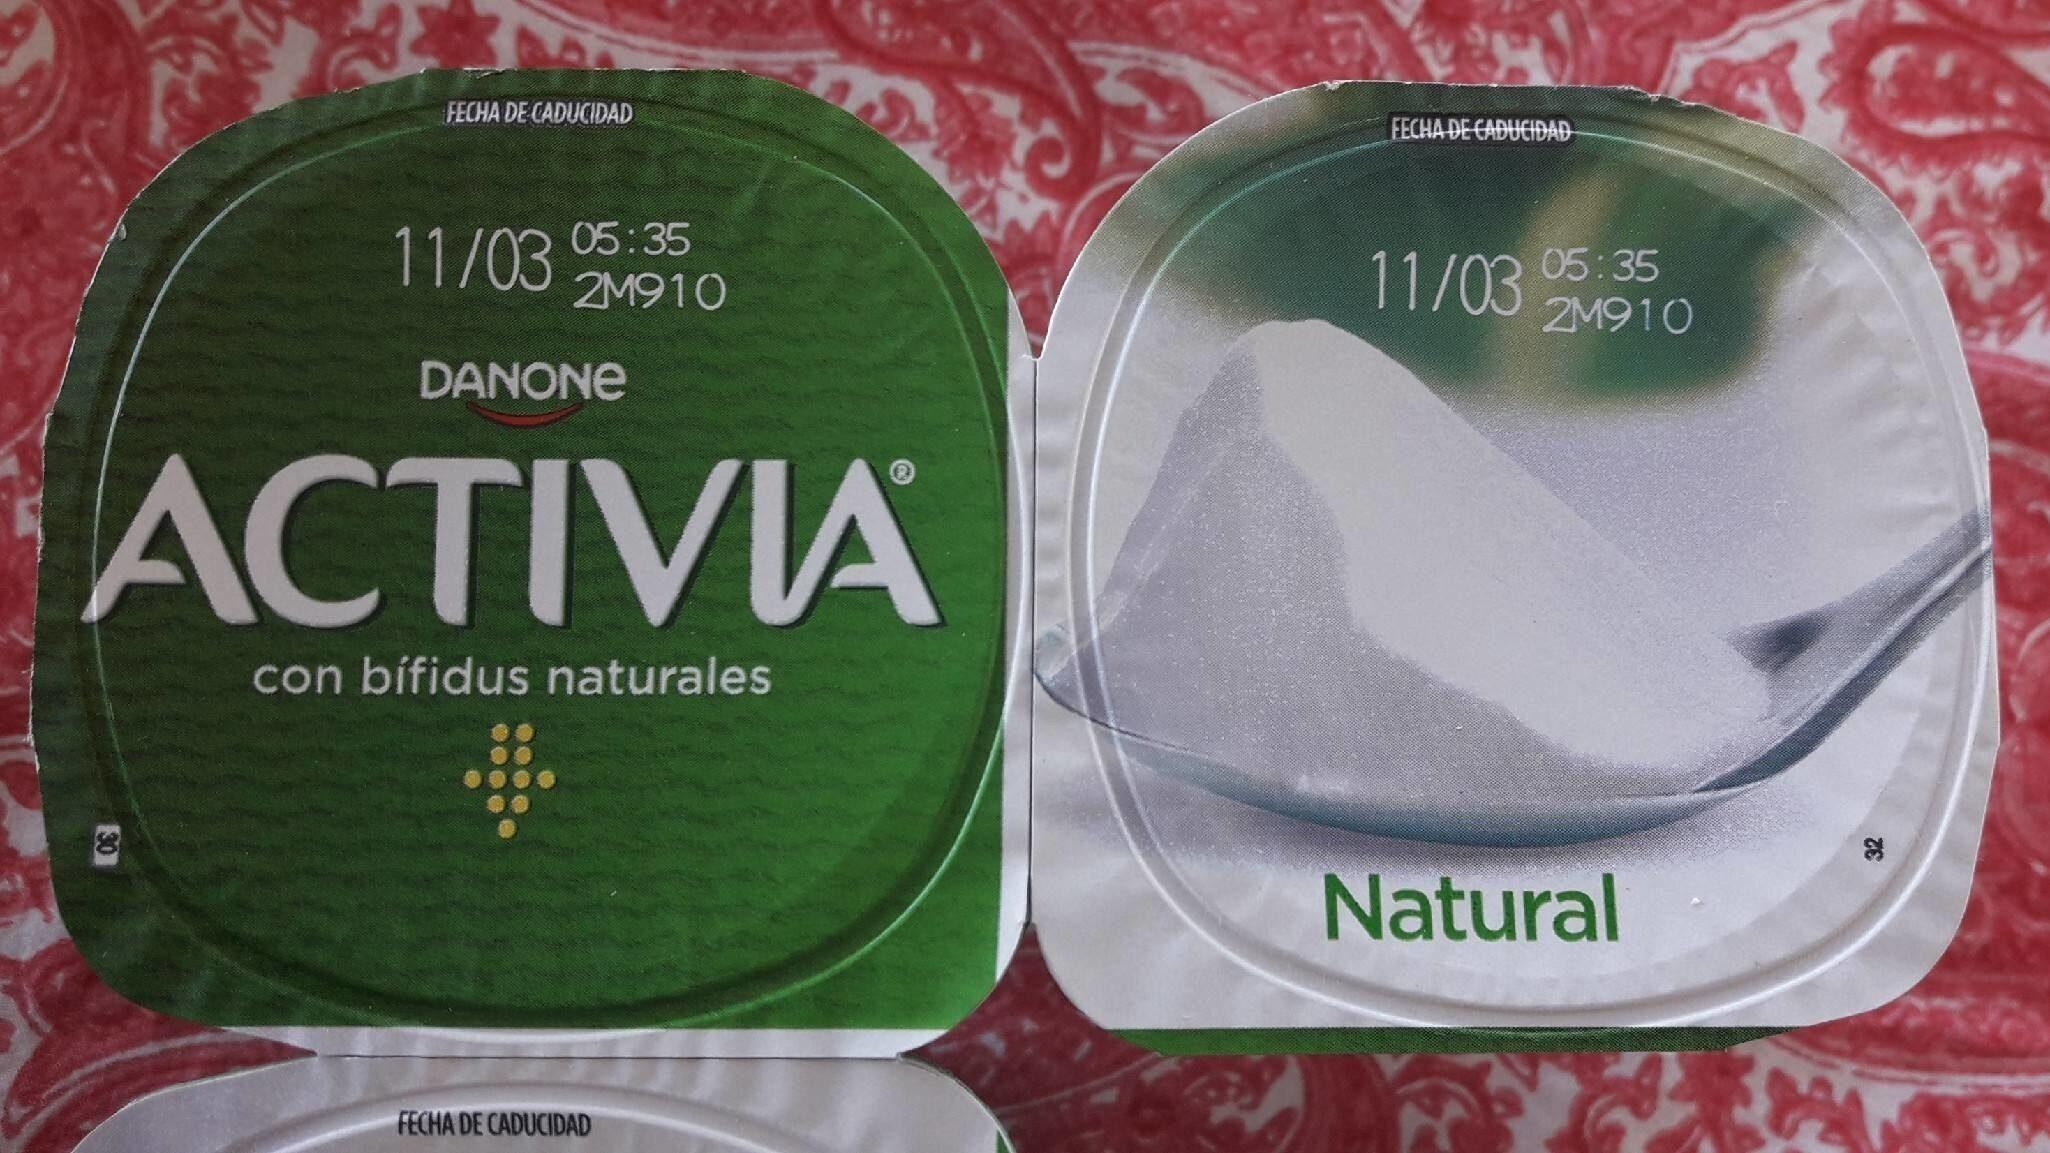 Activia con bífidus naturales (natural) - Product - es